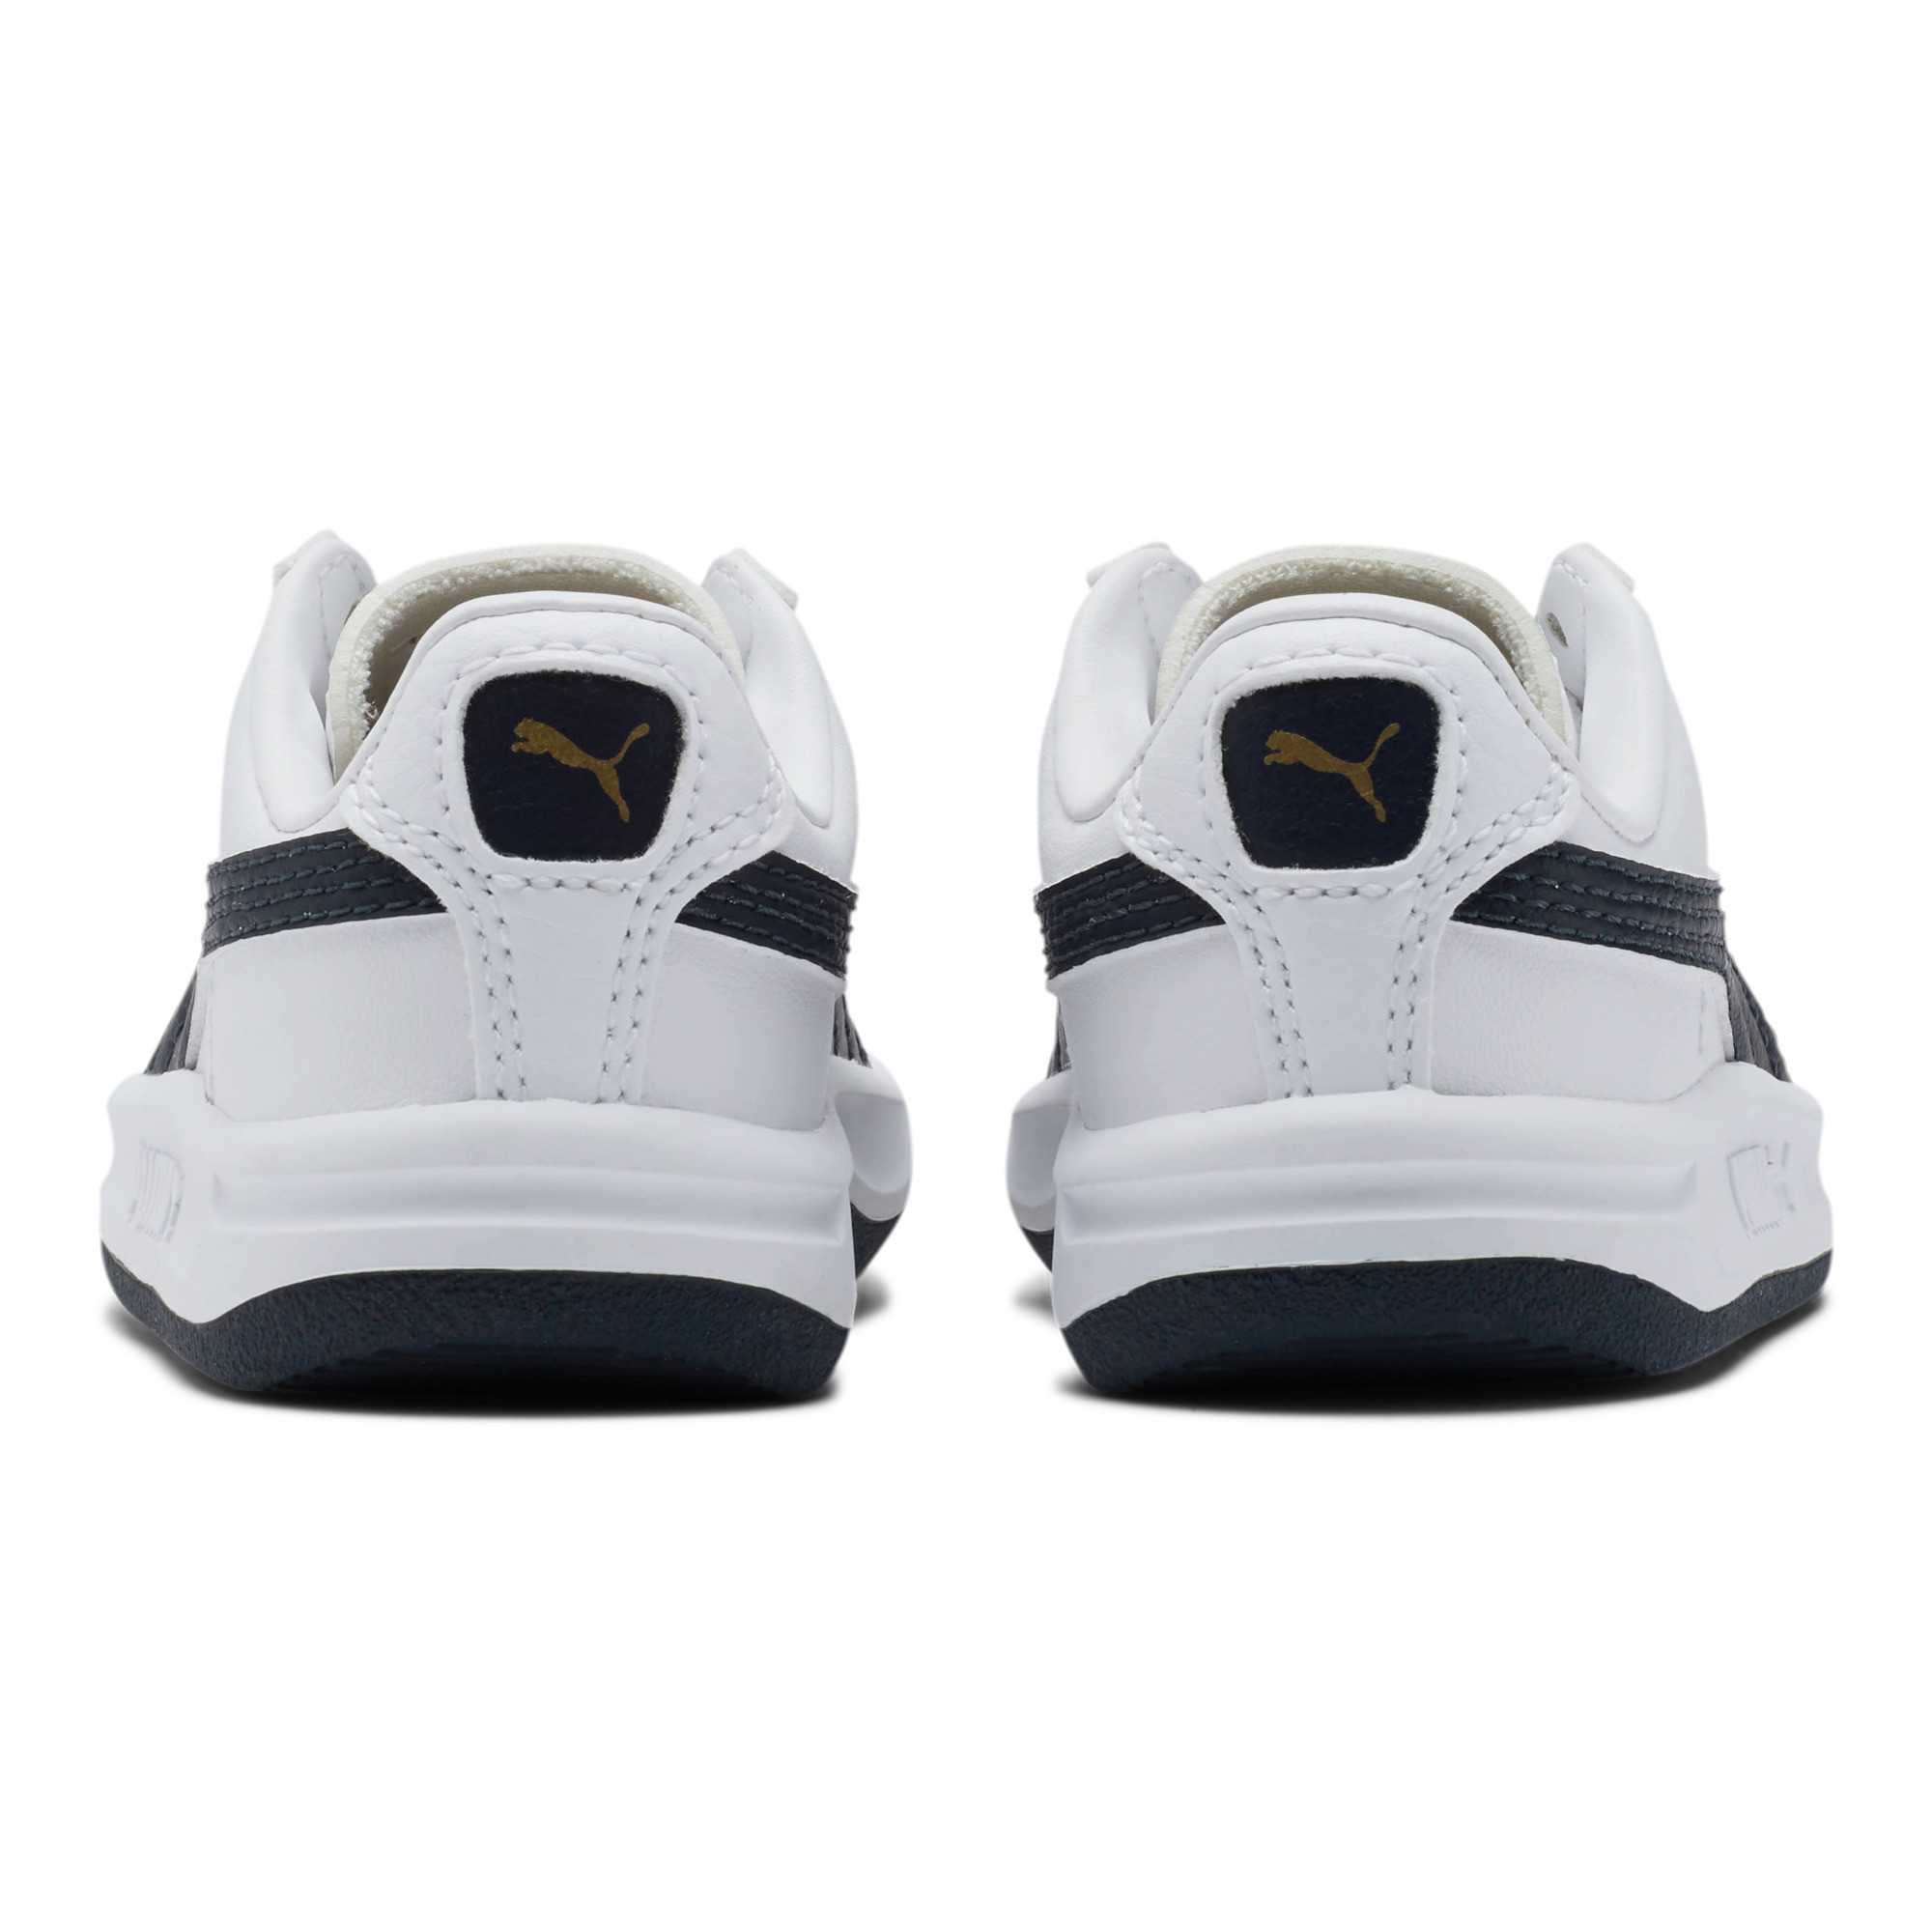 PUMA-Infant-GV-Special-Shoes thumbnail 8